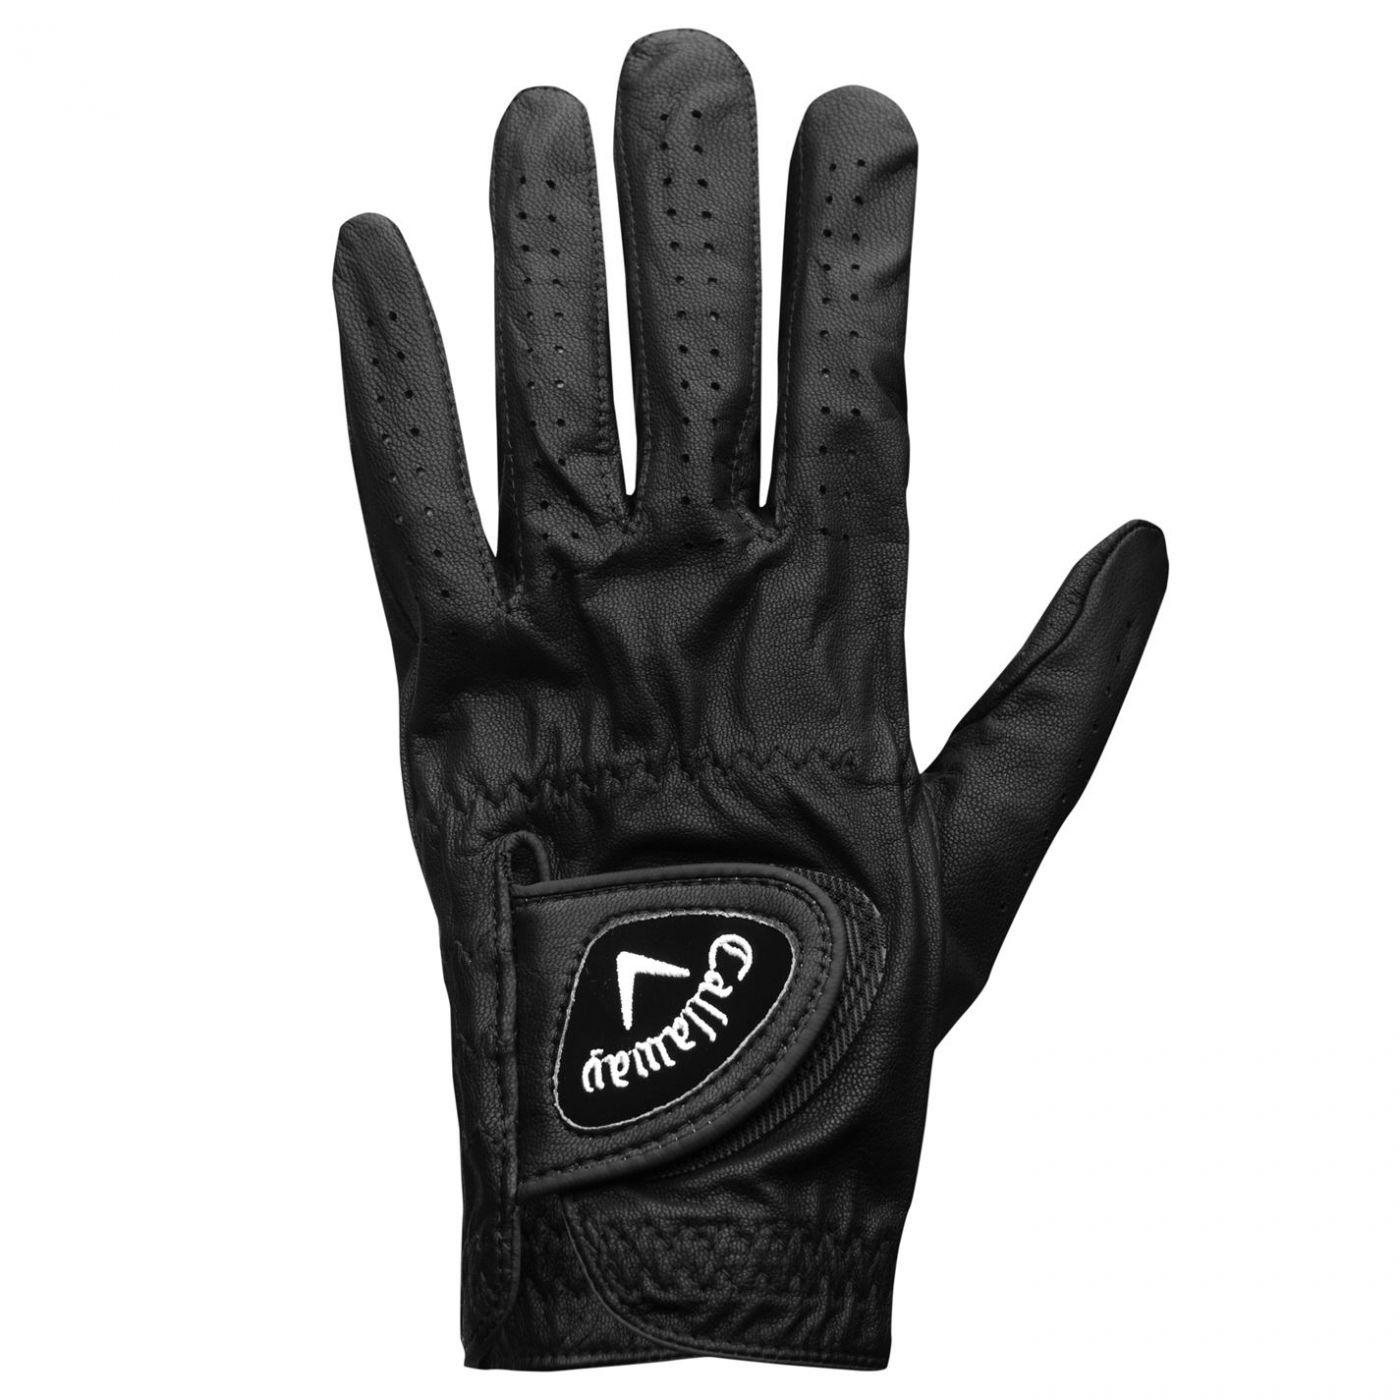 Callaway Opti-Color Golf Glove